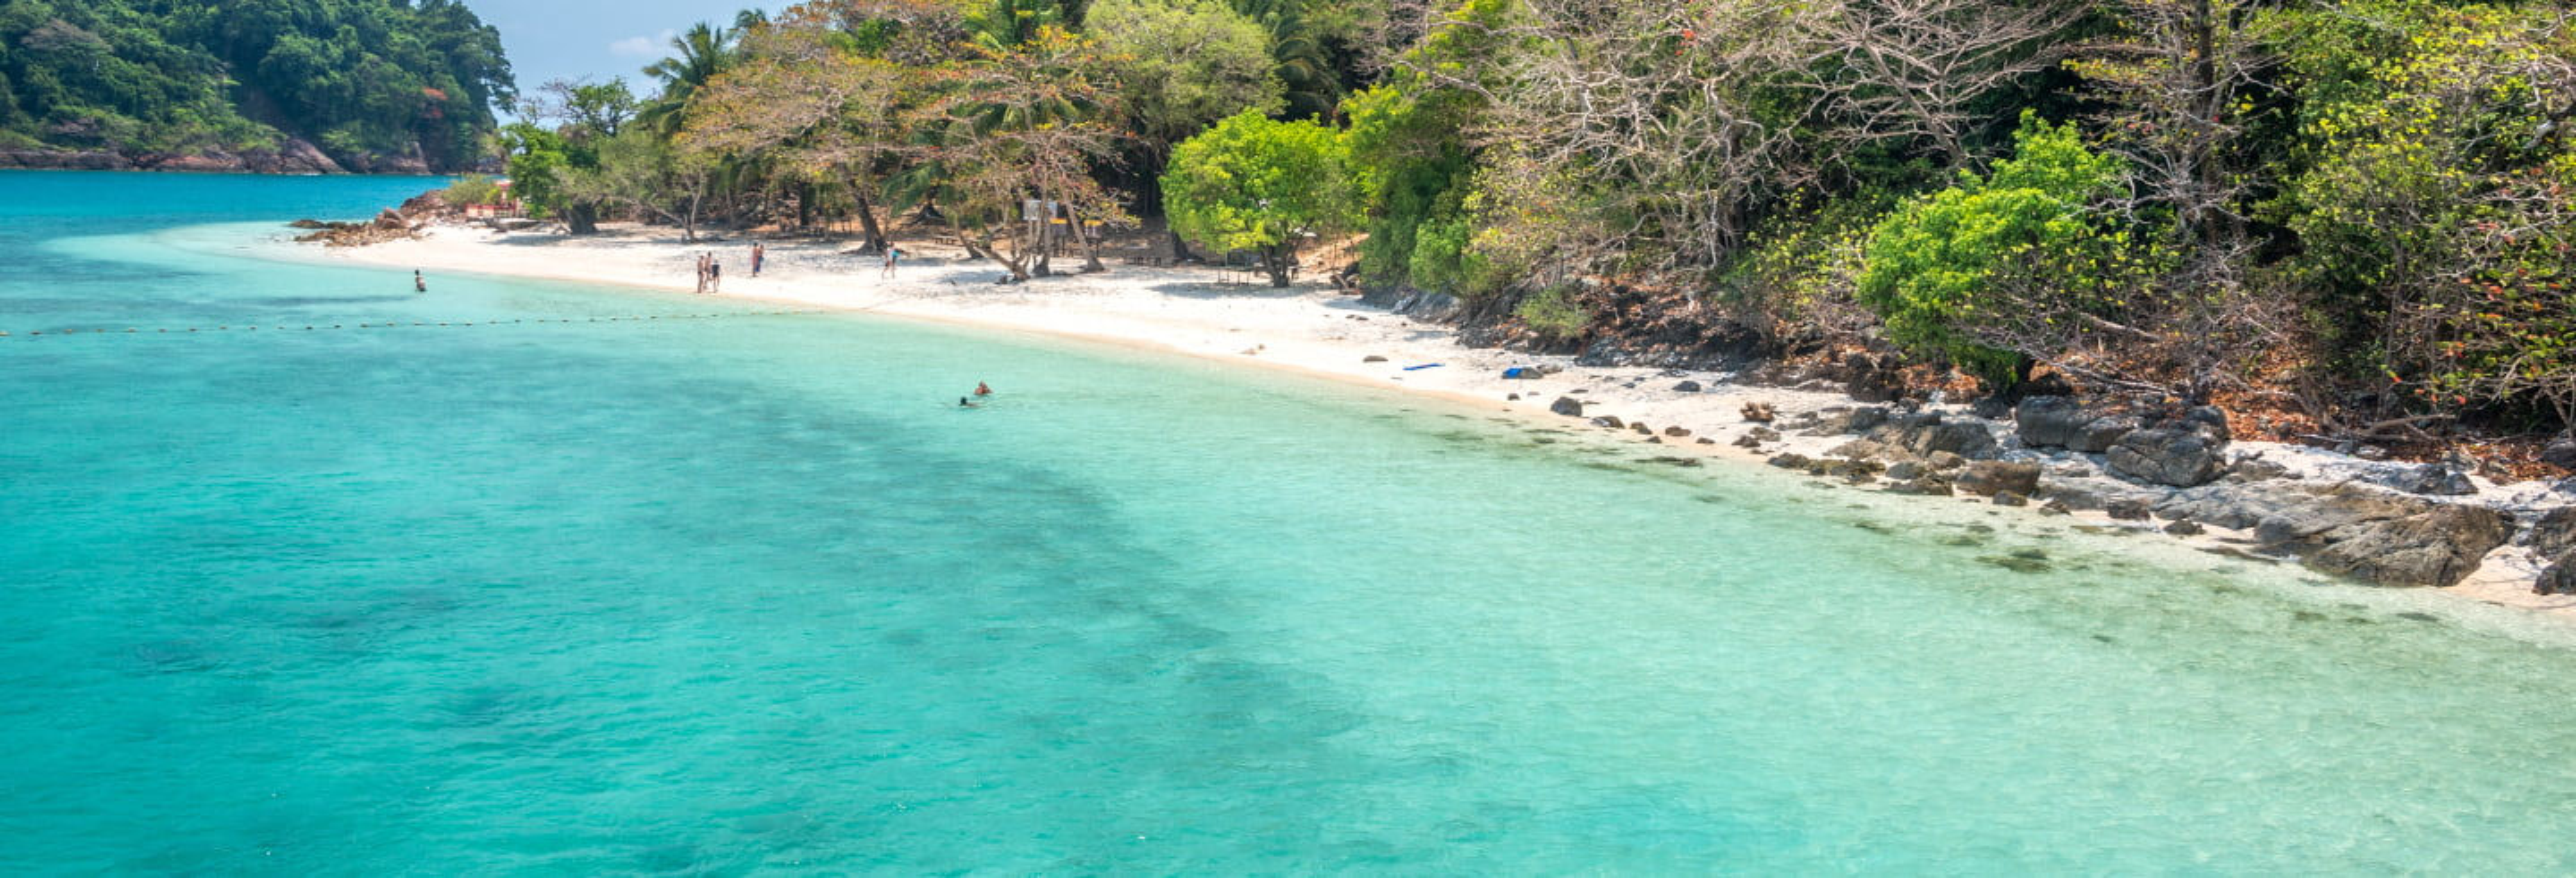 Snorkeling à Koh Rang